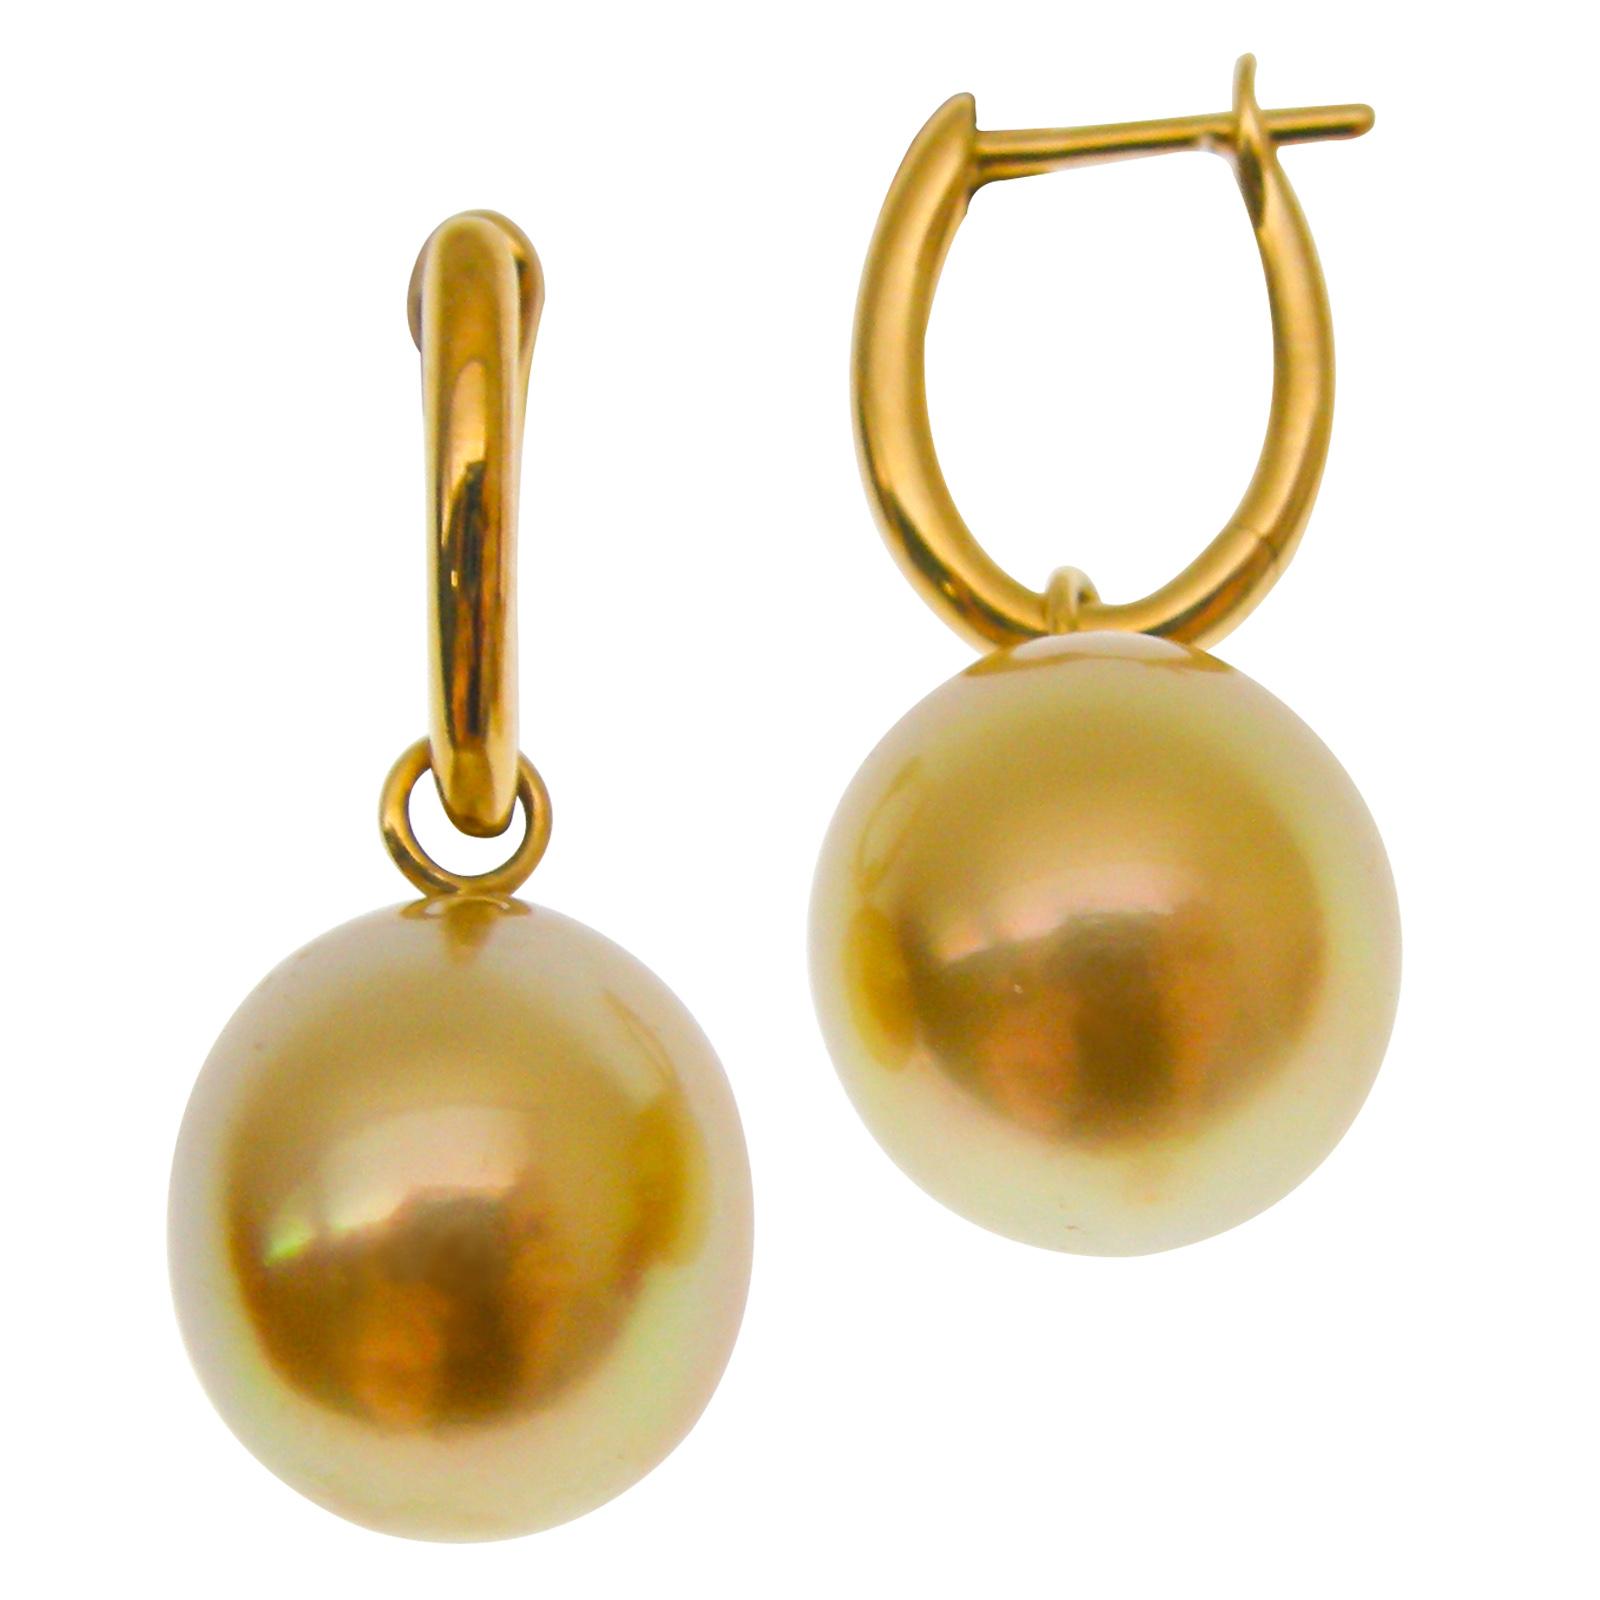 SOUTH SEA GOLDEN PEARL HUGGIE EARRINGS CLUSTER DIAMOND PENDANT BESPOKE FINE JEWELLERY BY SHAHINA HATTA